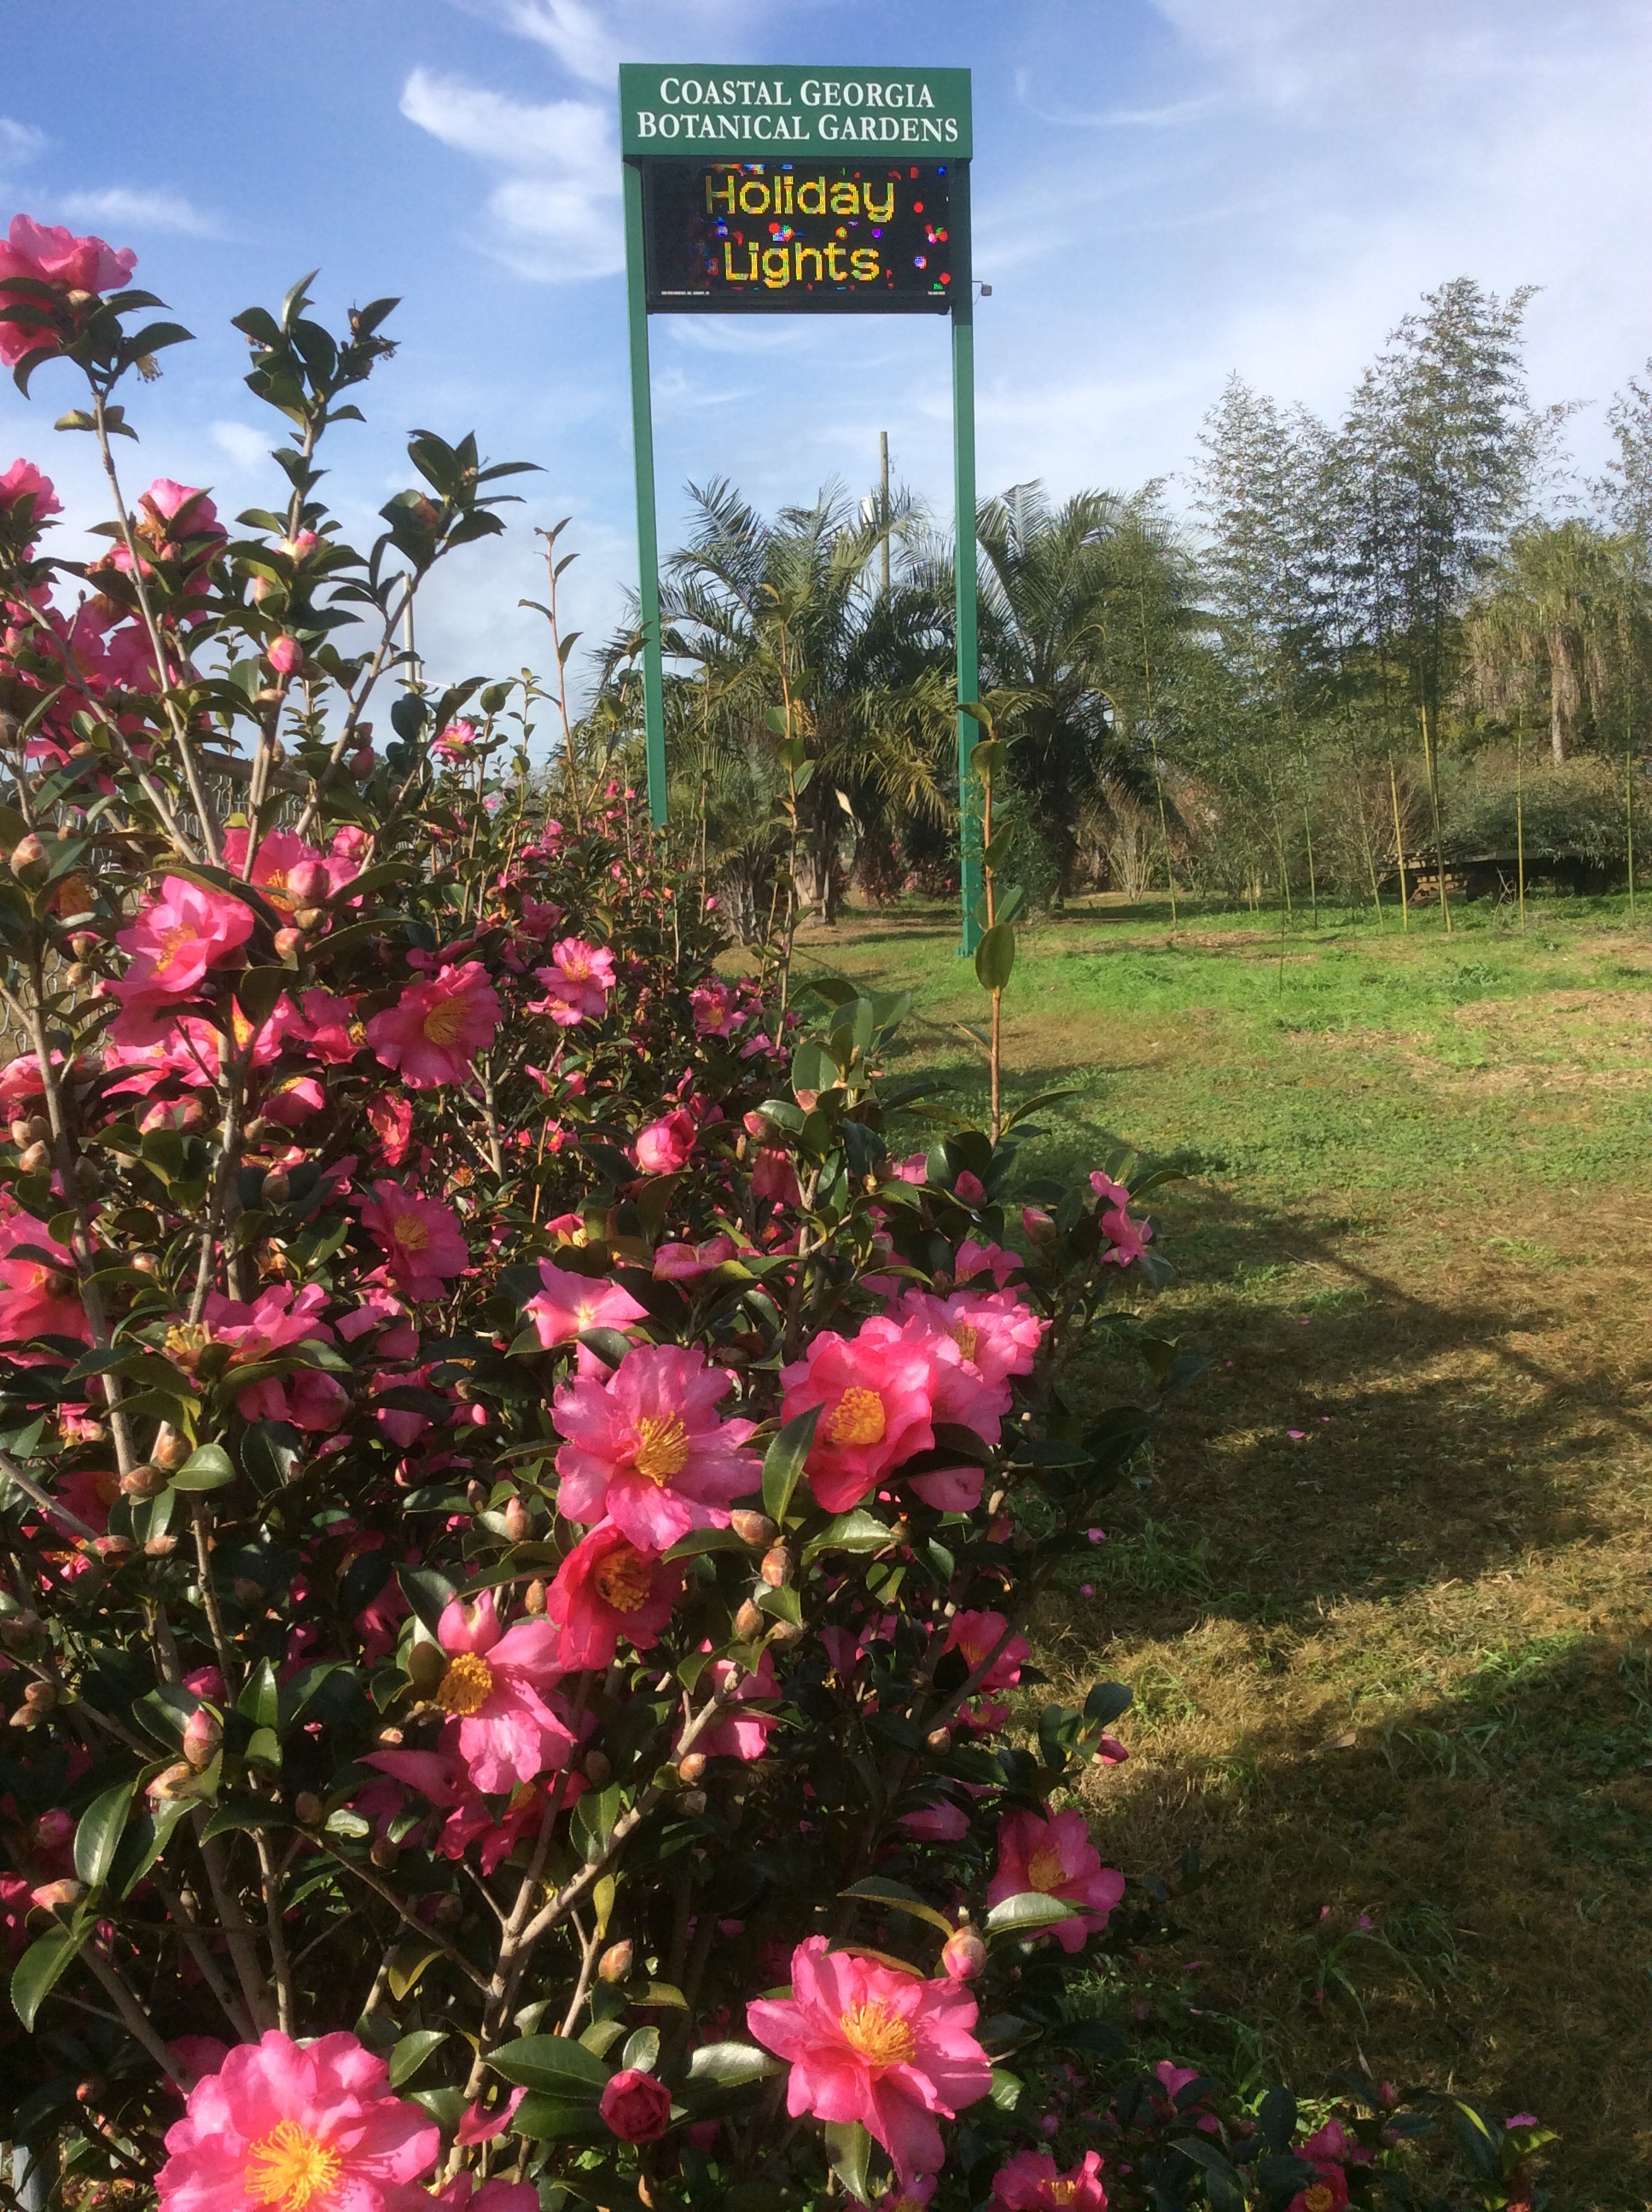 Hundreds of 'Kanjiro' camellias have been planted as a screen at the University of Georgia Coastal Georgia Botanical Gardens in Savannah, Georgia.